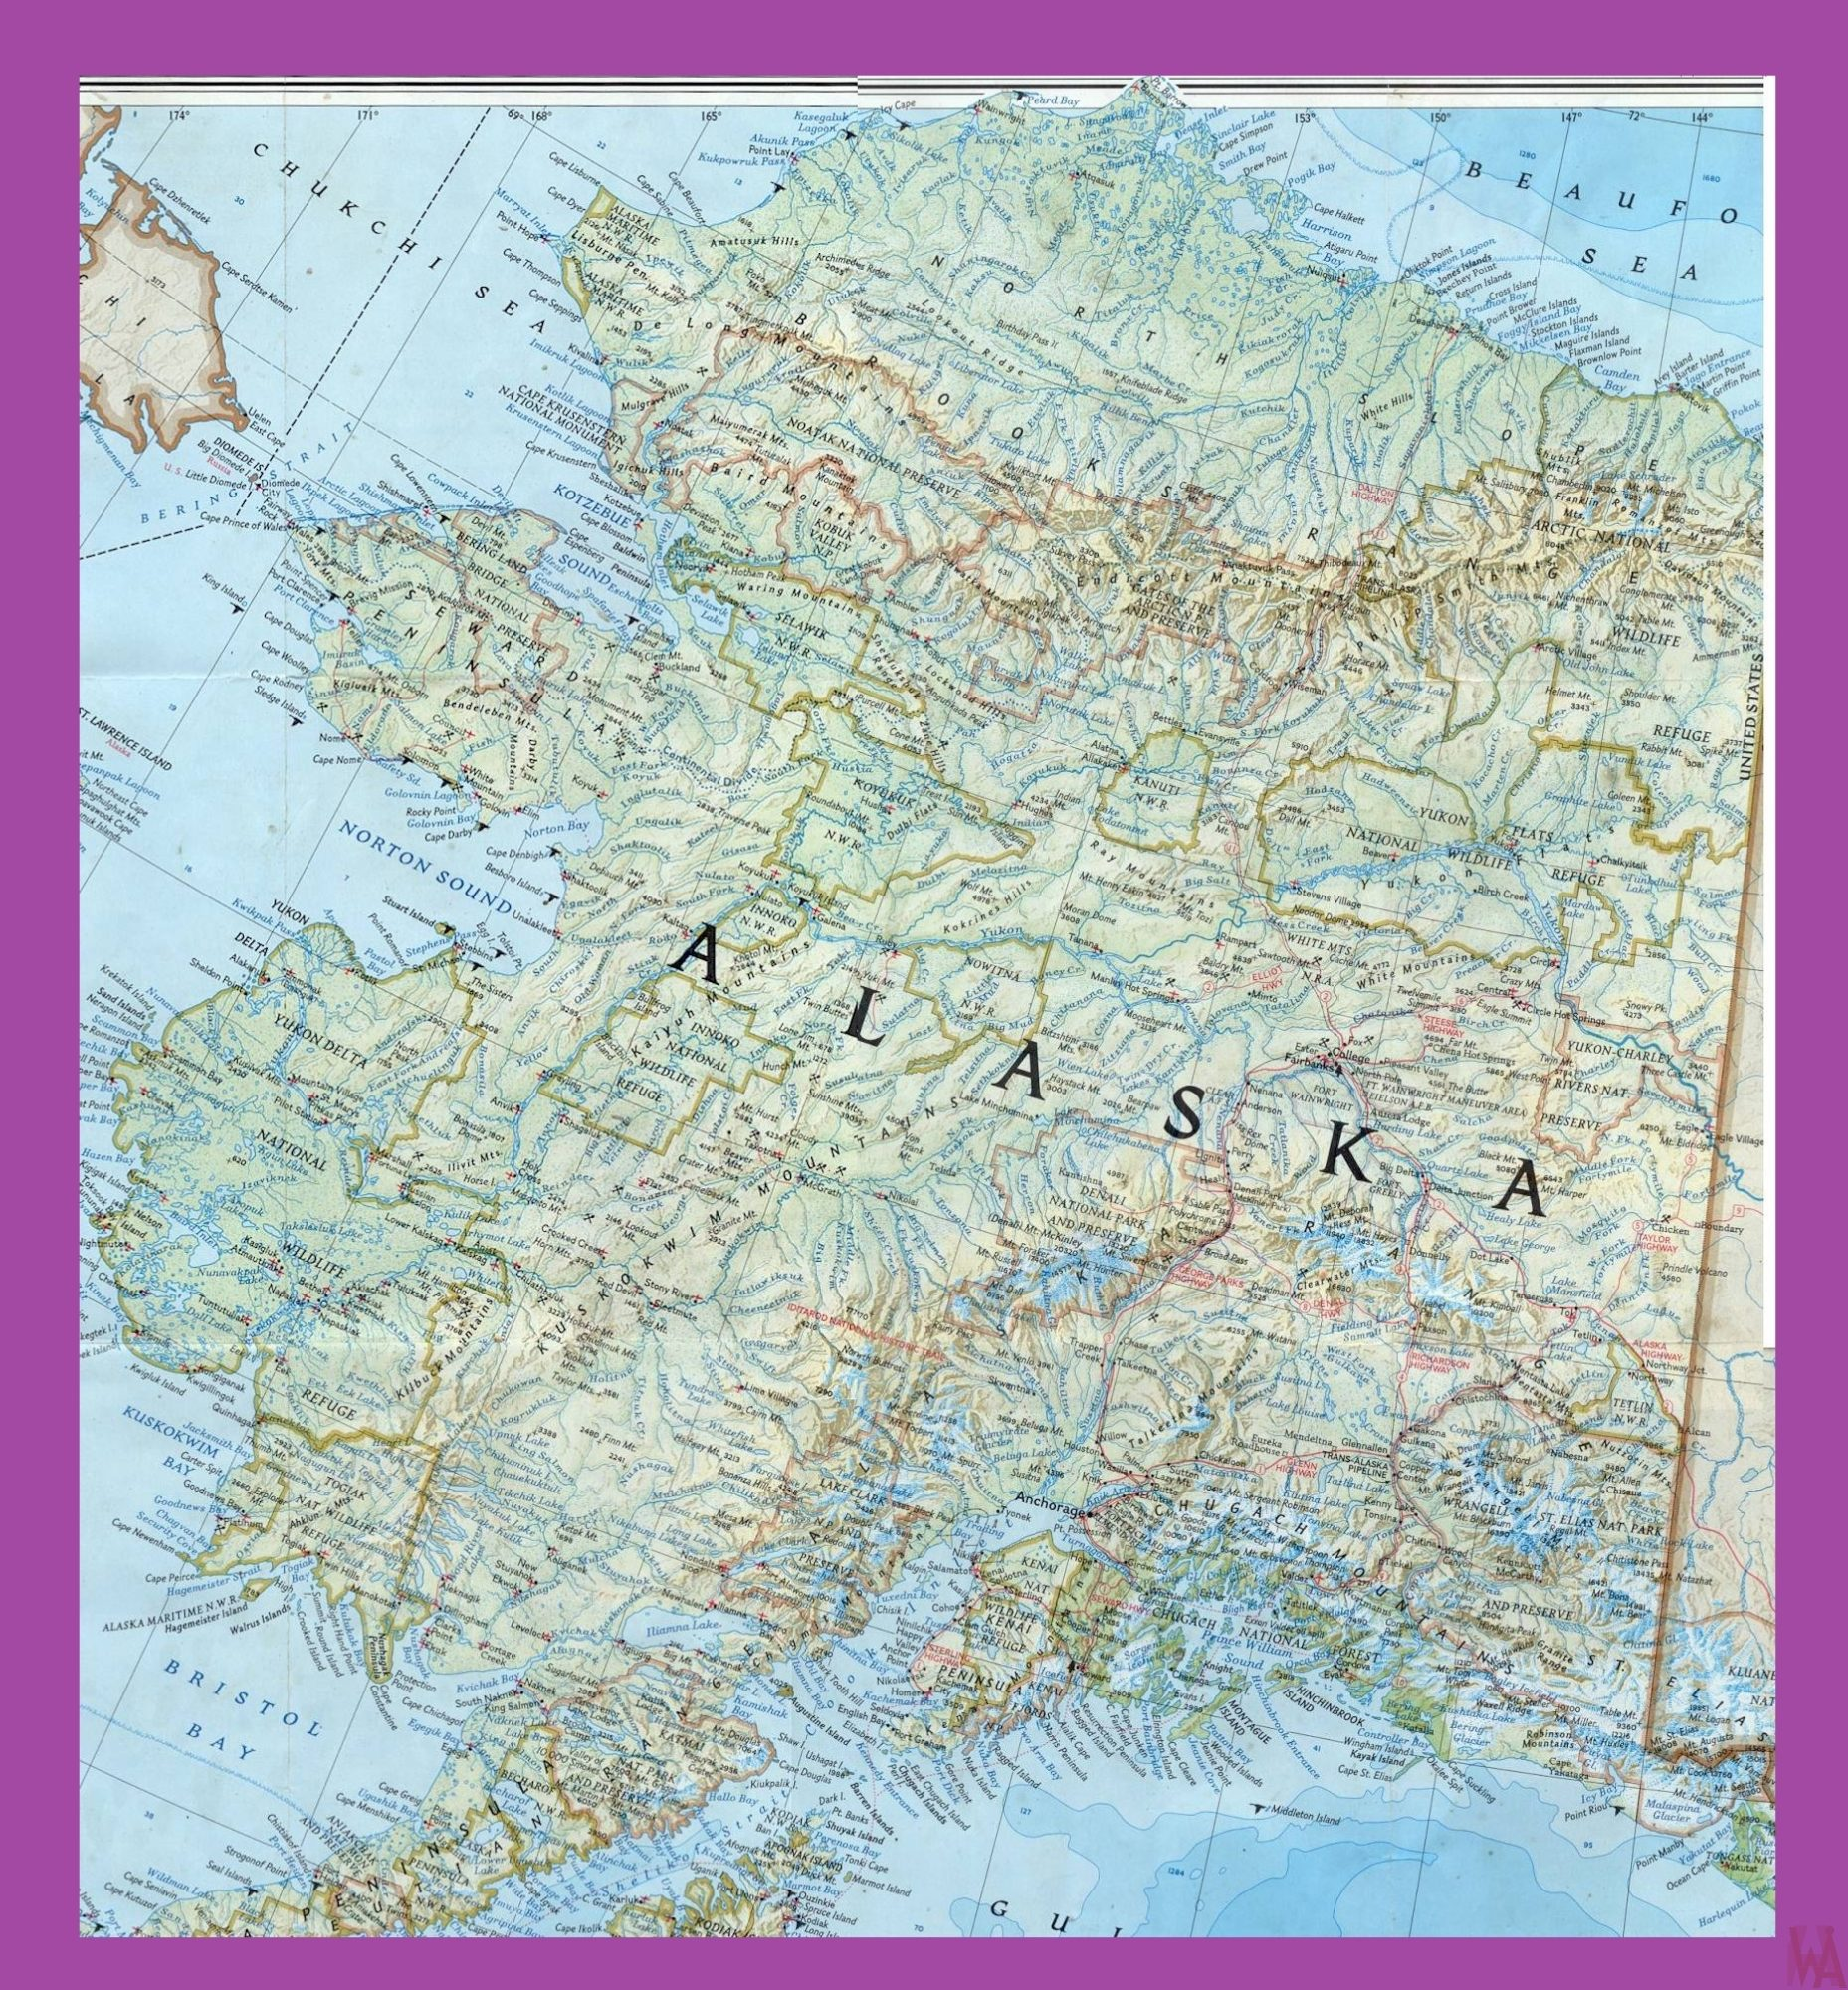 Alaska Large Detailed Map | Large Detailed Map of Alaska